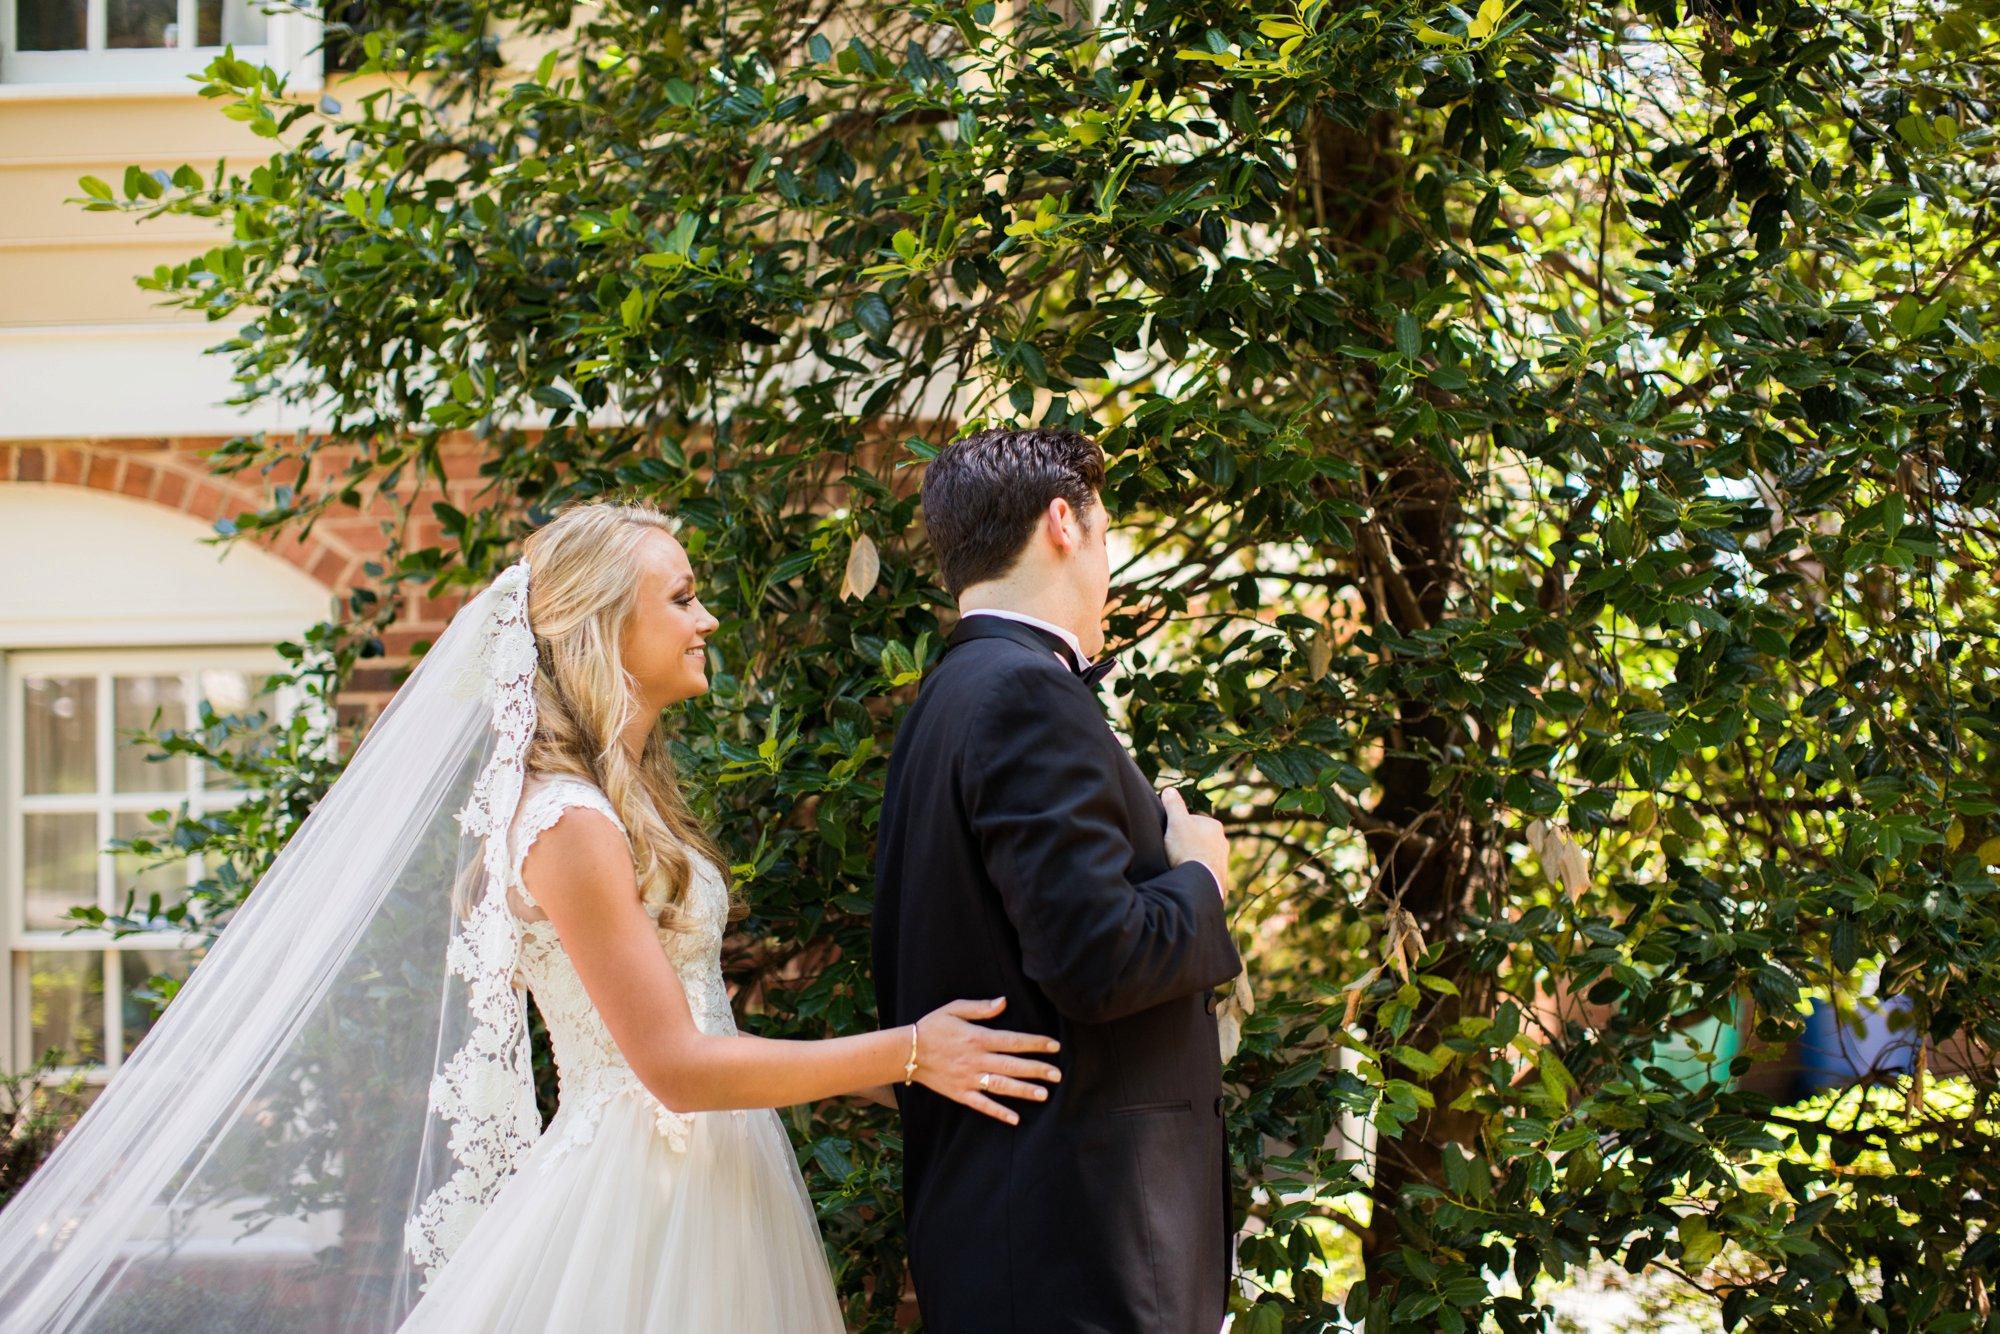 wedding-photography-88-love-stories_0009.jpg